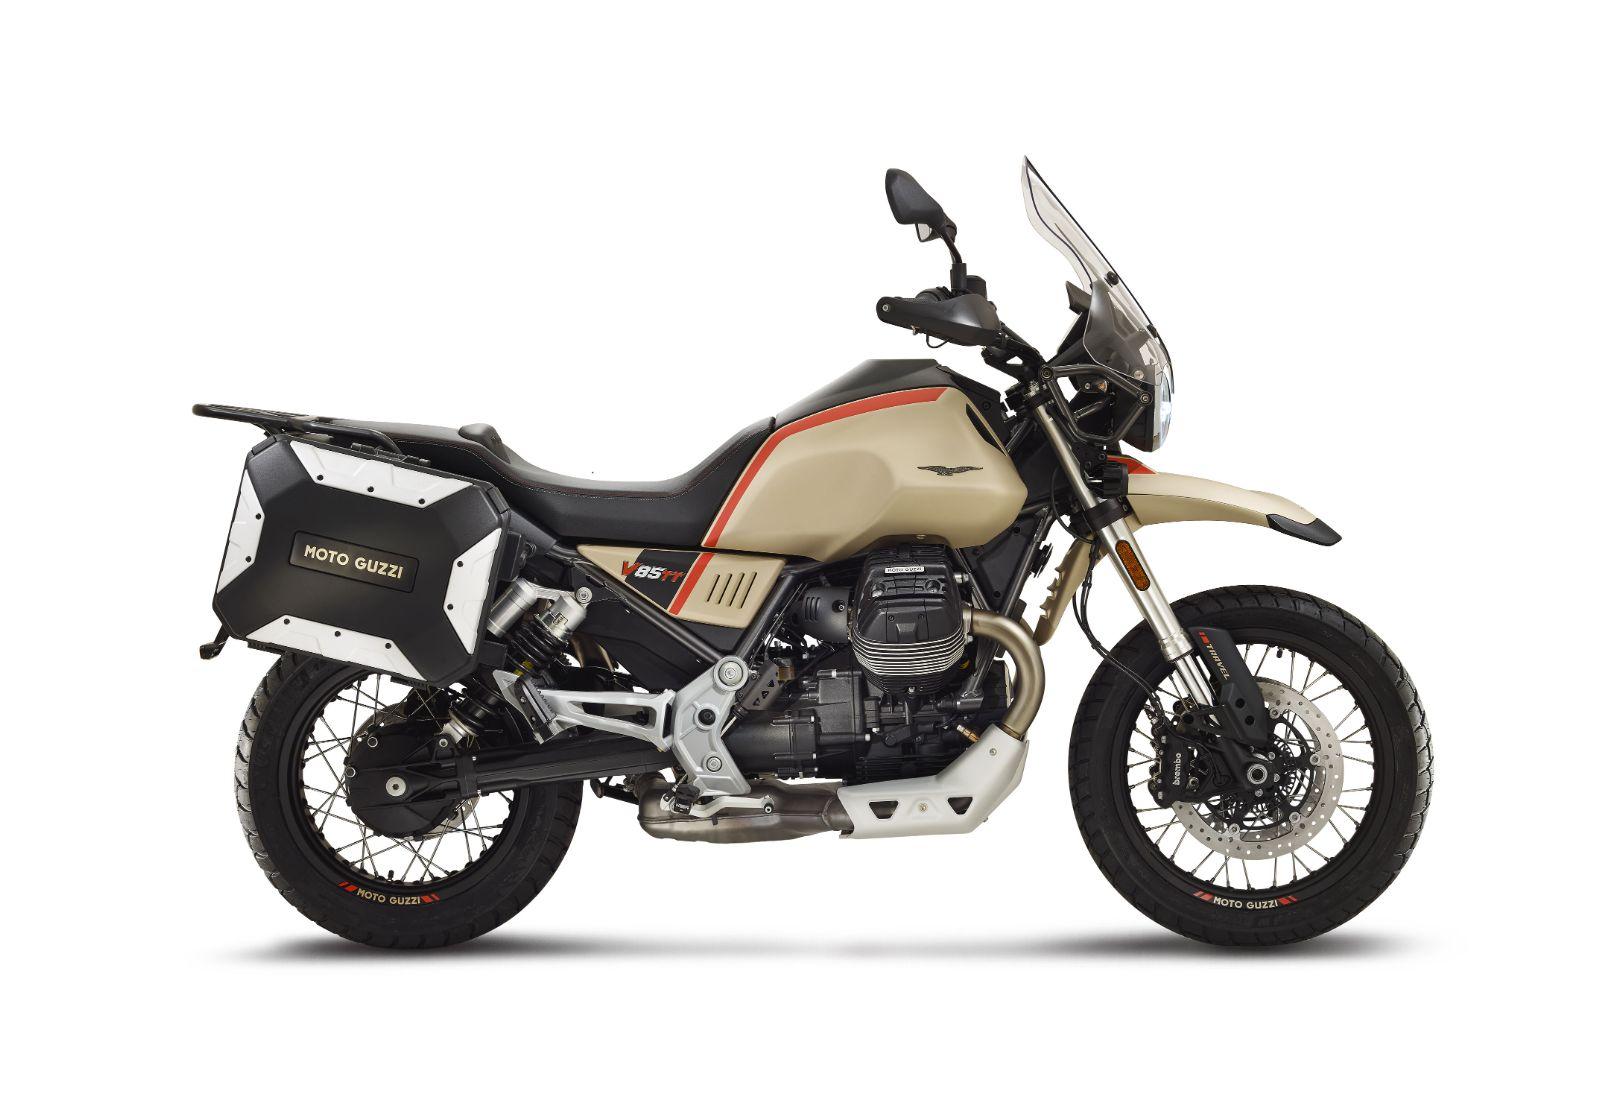 2021 Moto Guzzi V85 TT Travel